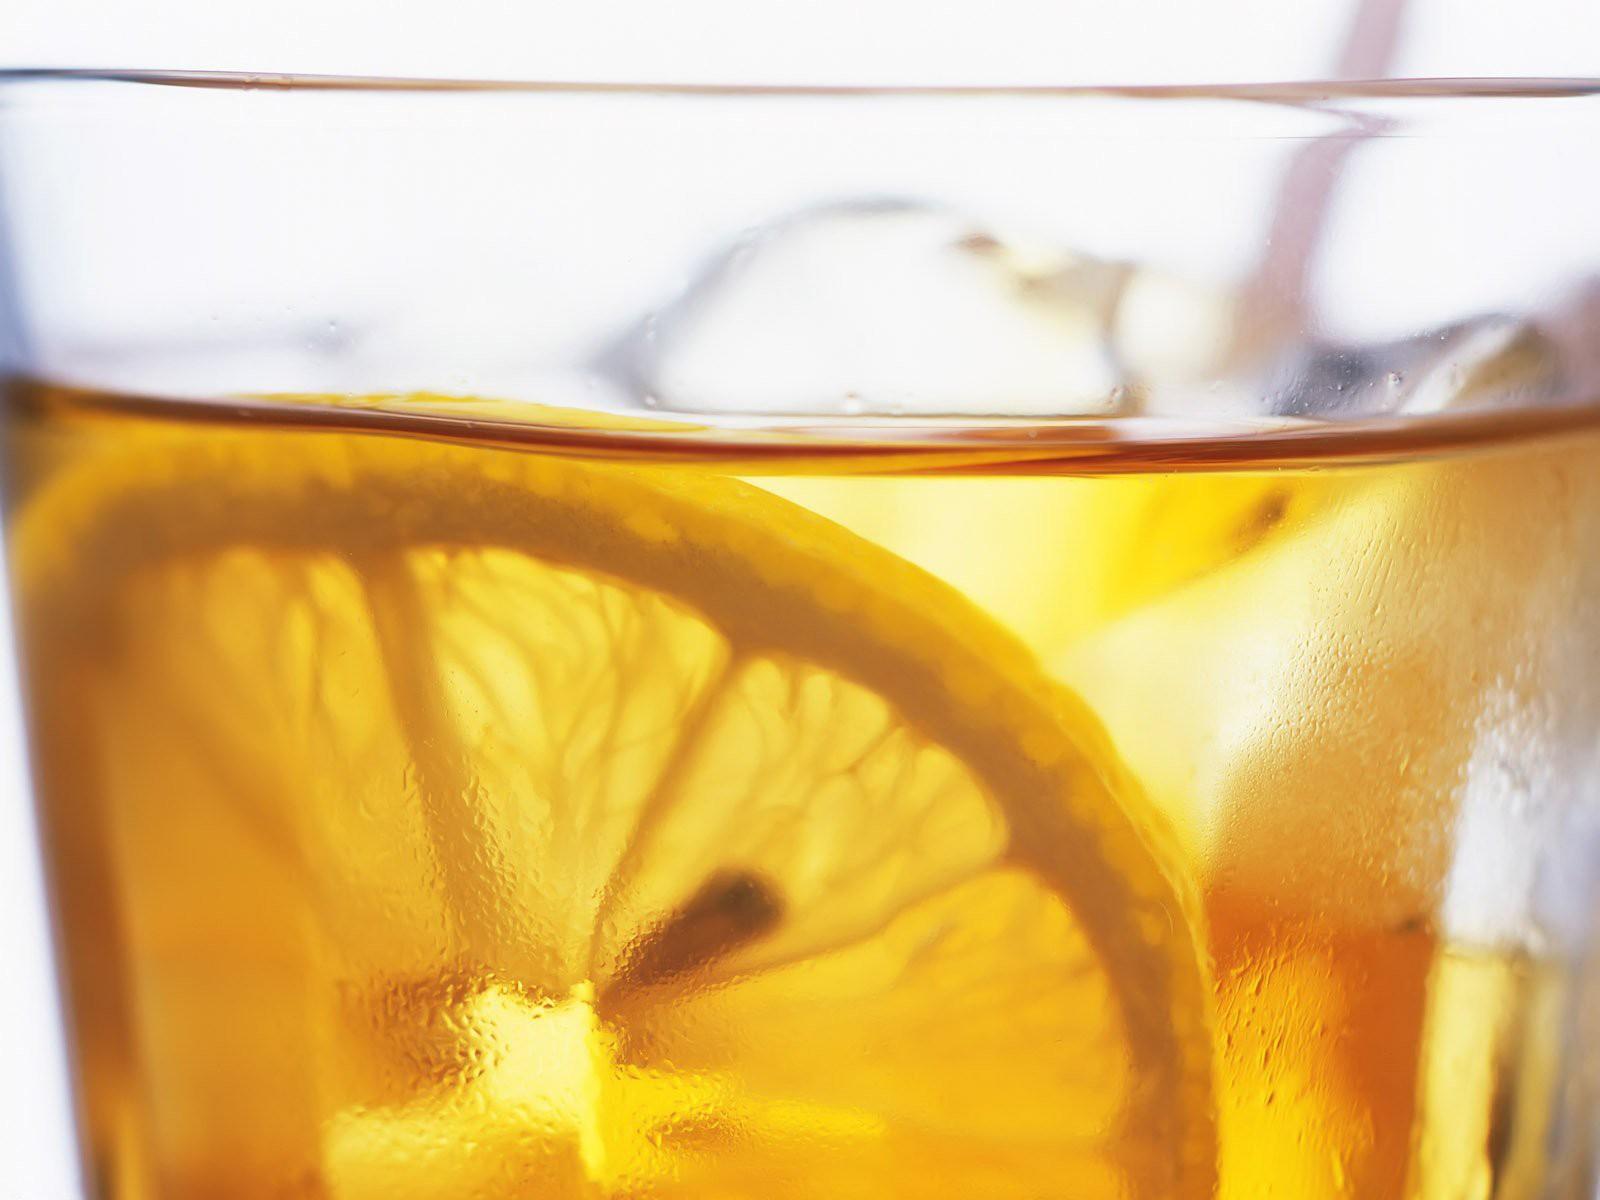 8 Lovely HD Lemonade Drink Wallpapers